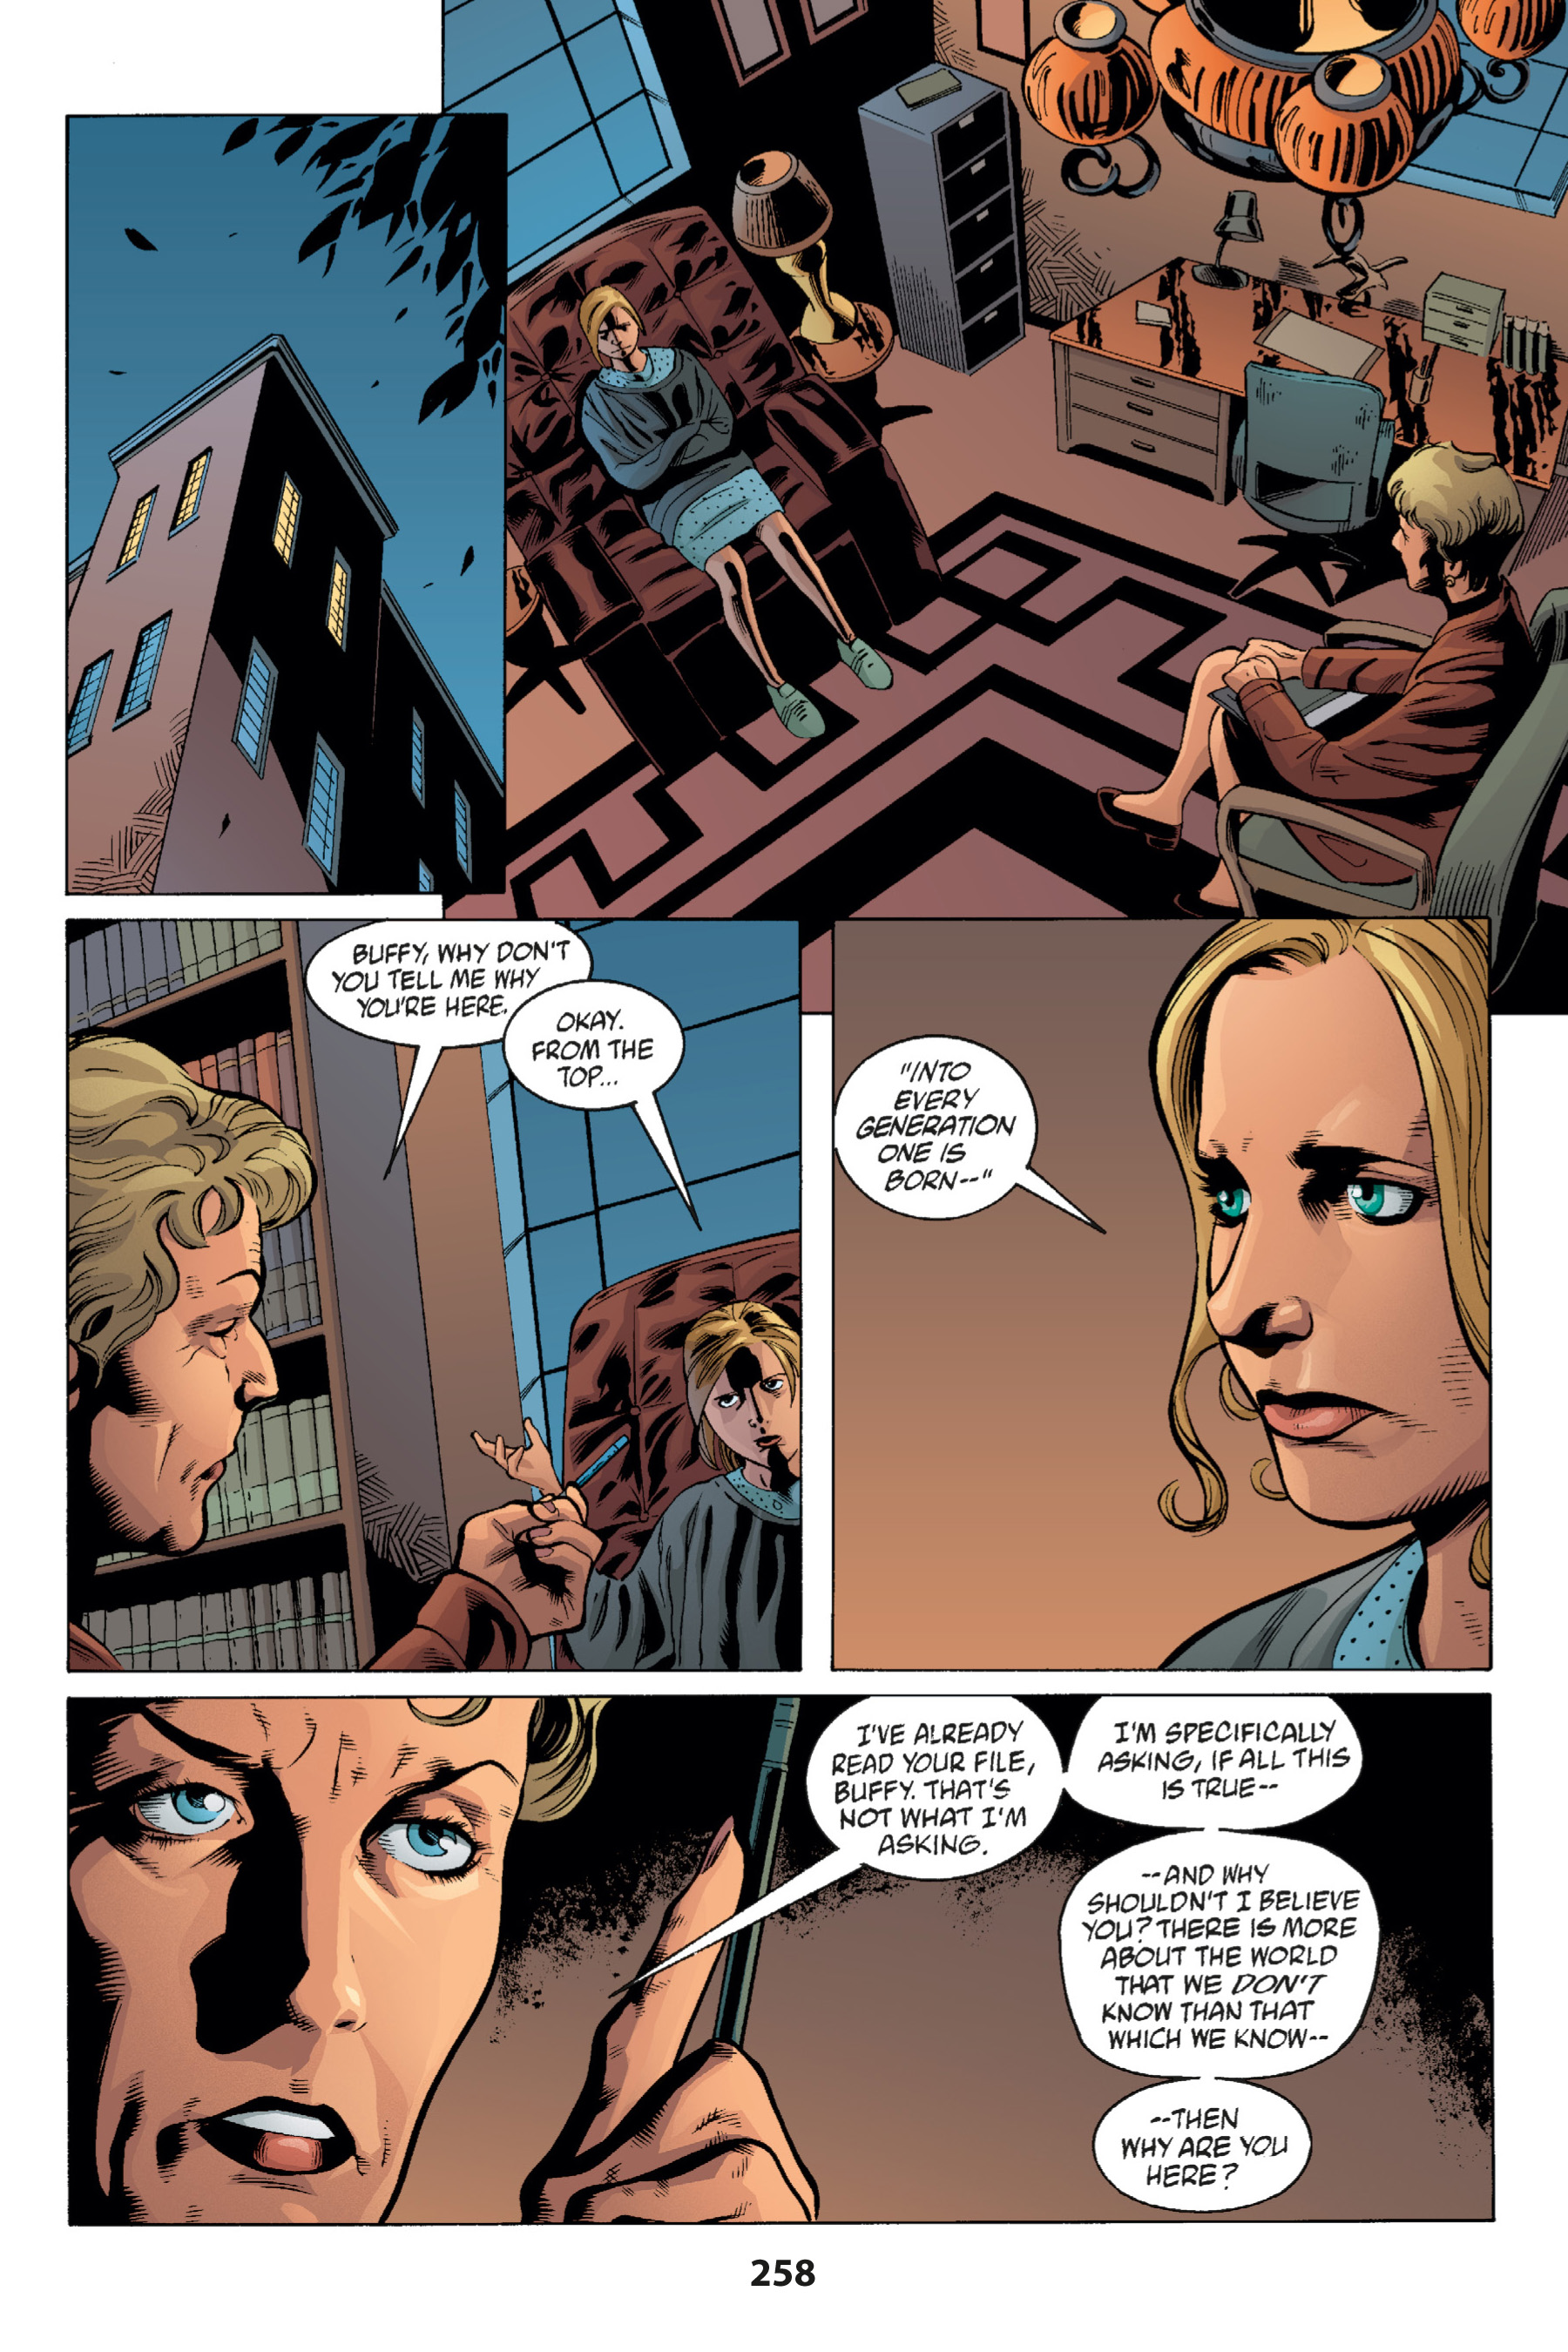 Read online Buffy the Vampire Slayer: Omnibus comic -  Issue # TPB 1 - 251